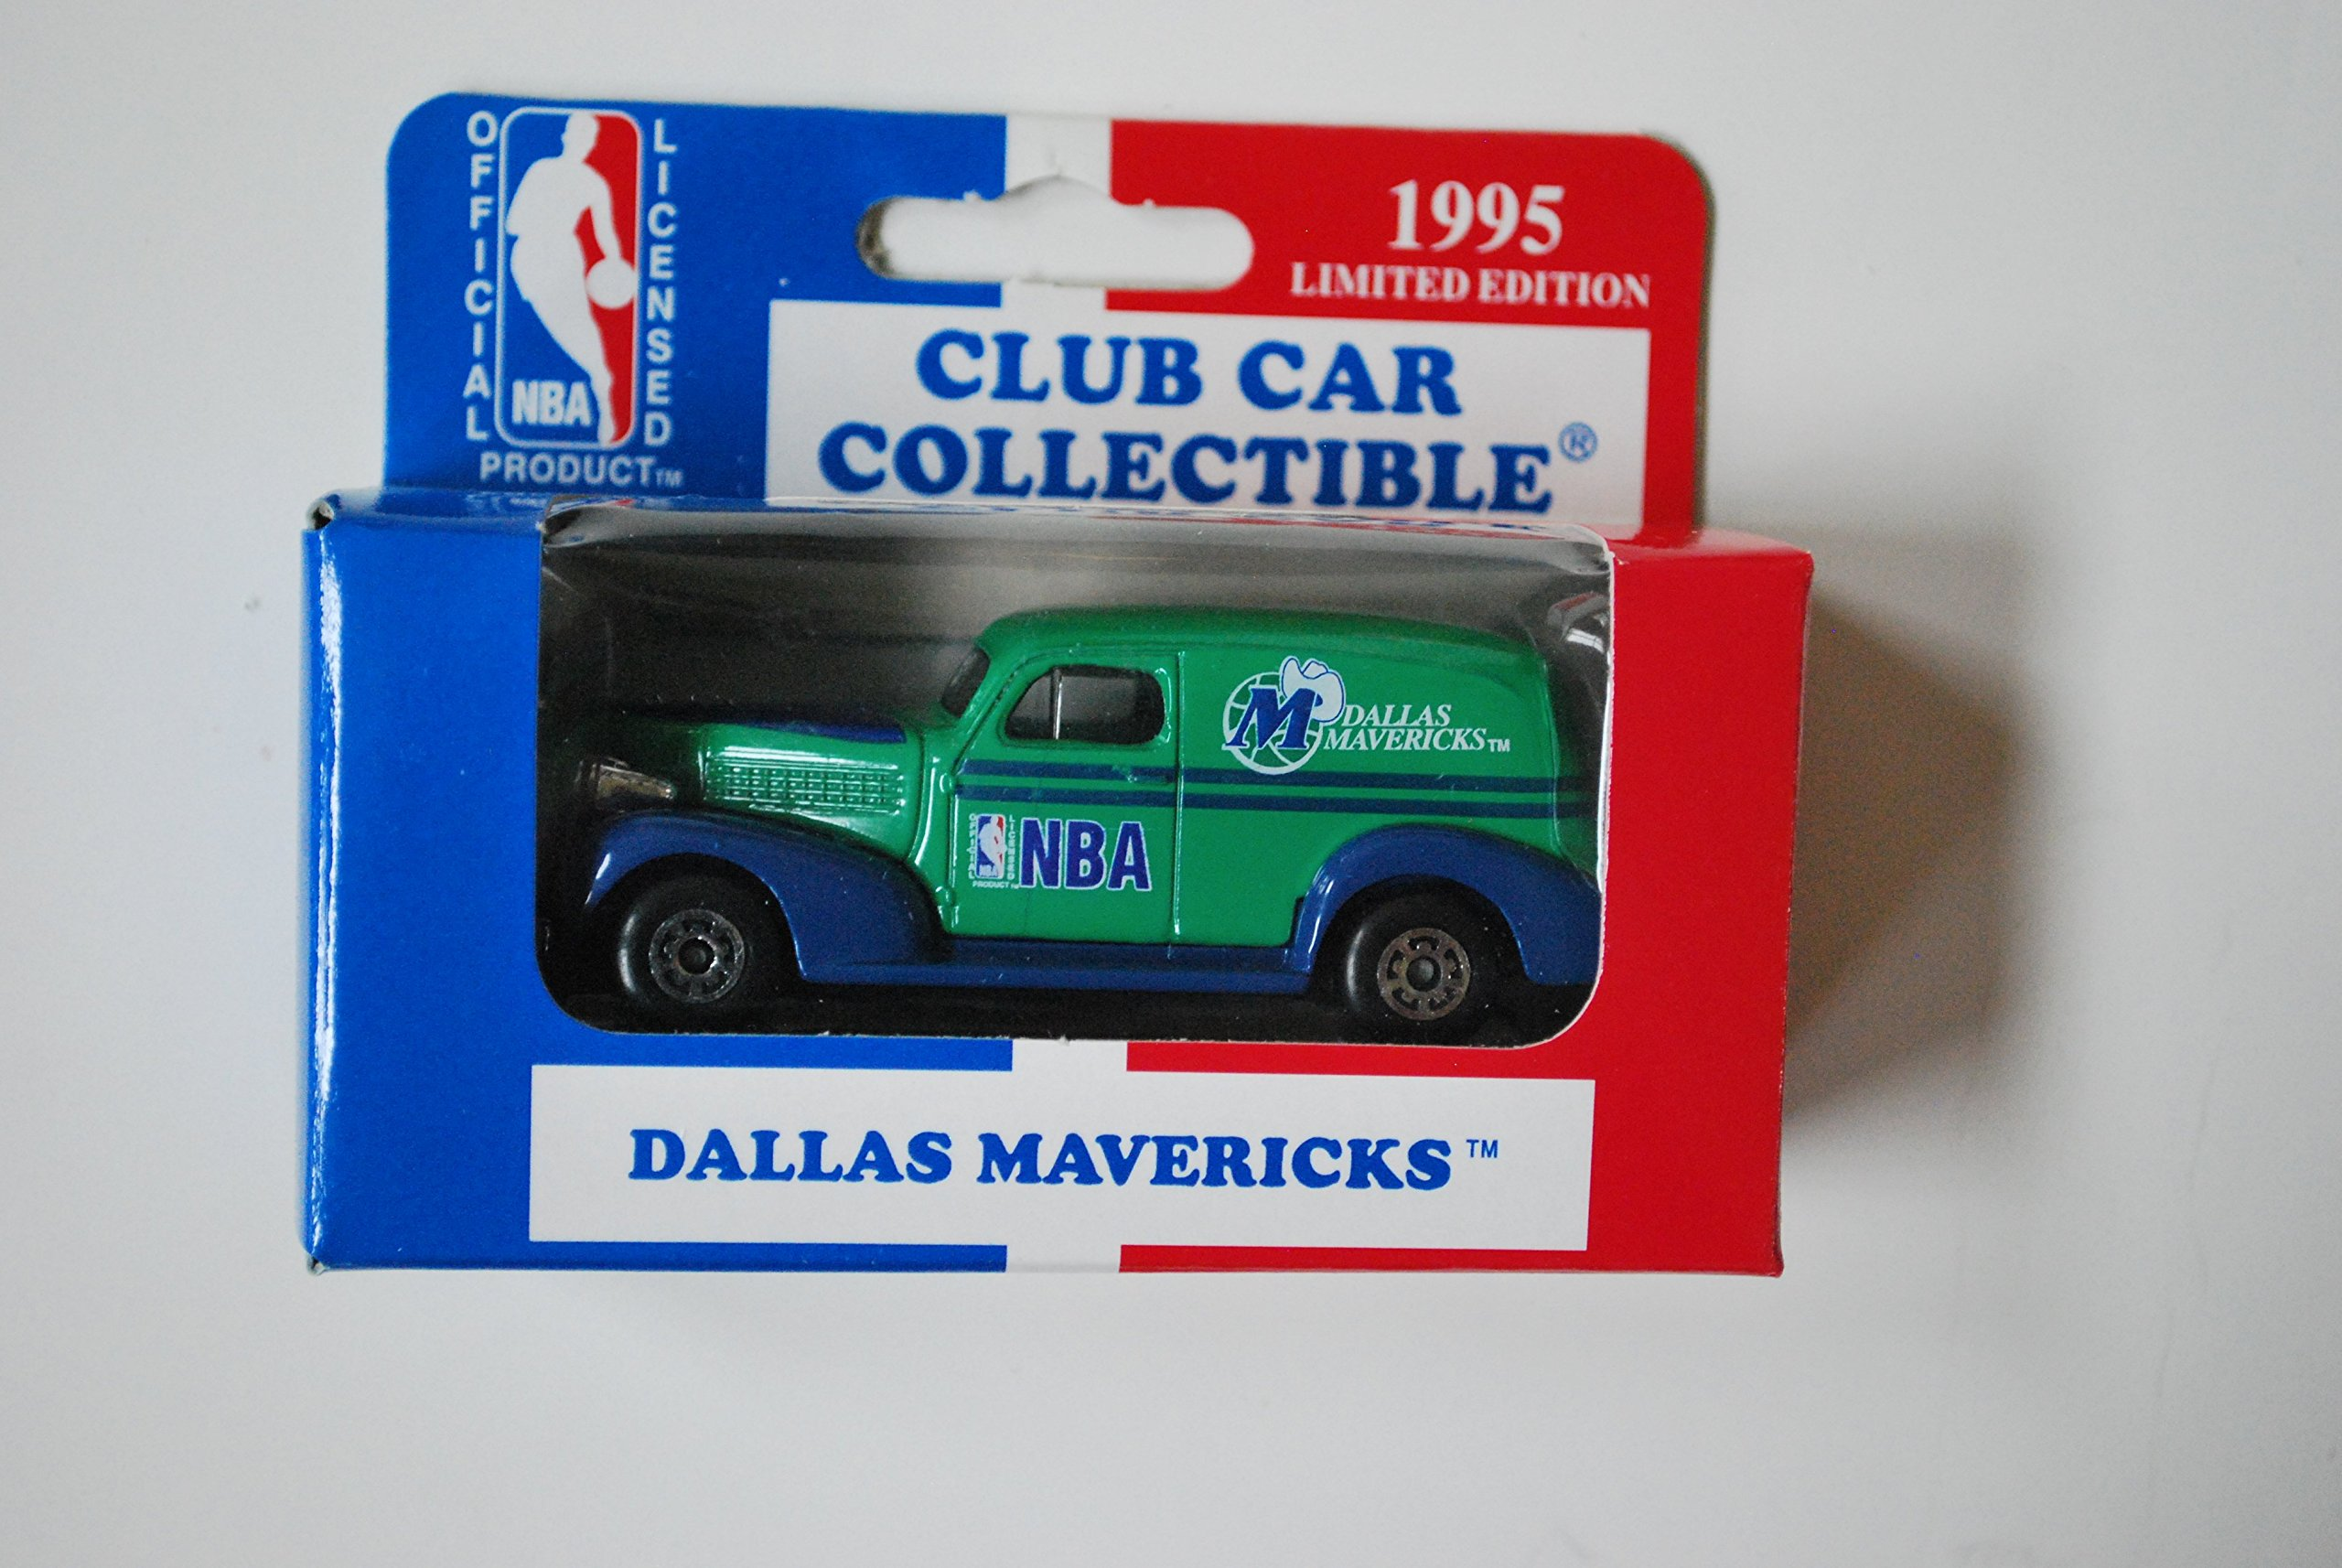 1995 Matchbox 1:64 Scale Model '39 Chevy Club Car Collectible DALLAS MAVERICKS